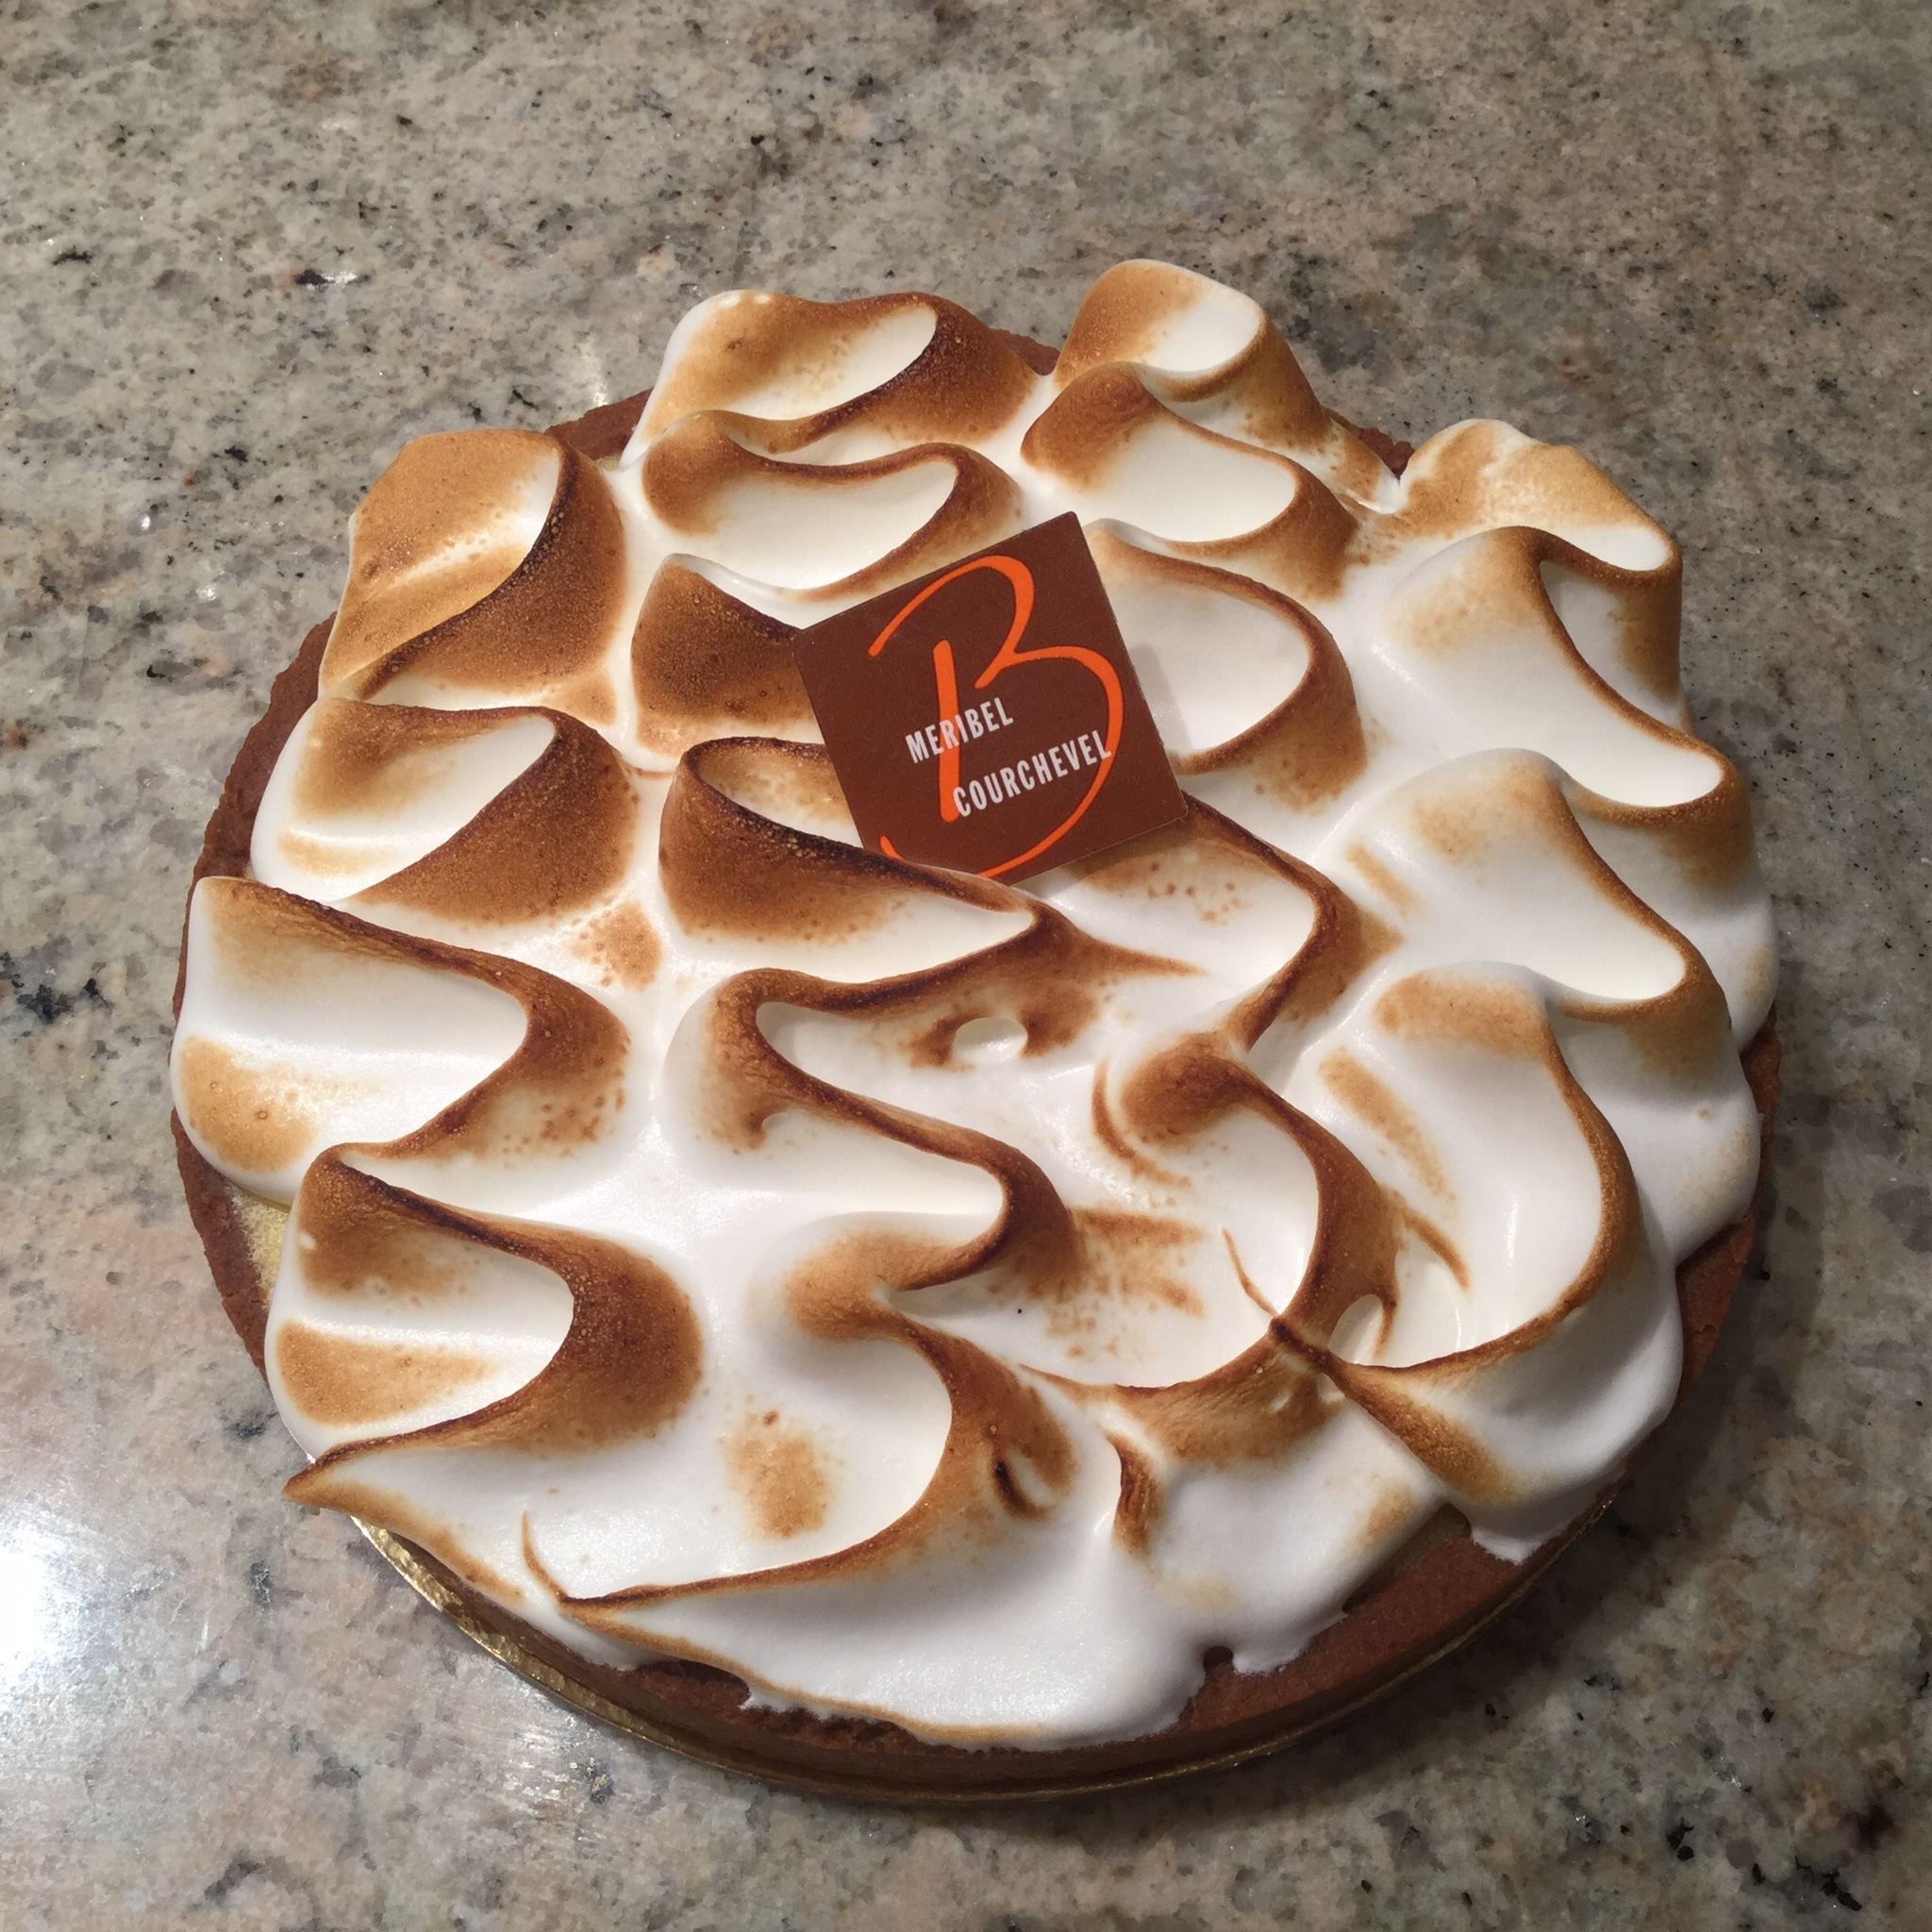 tarte au citron meringue boulangerie patisserie maison braissand meribel